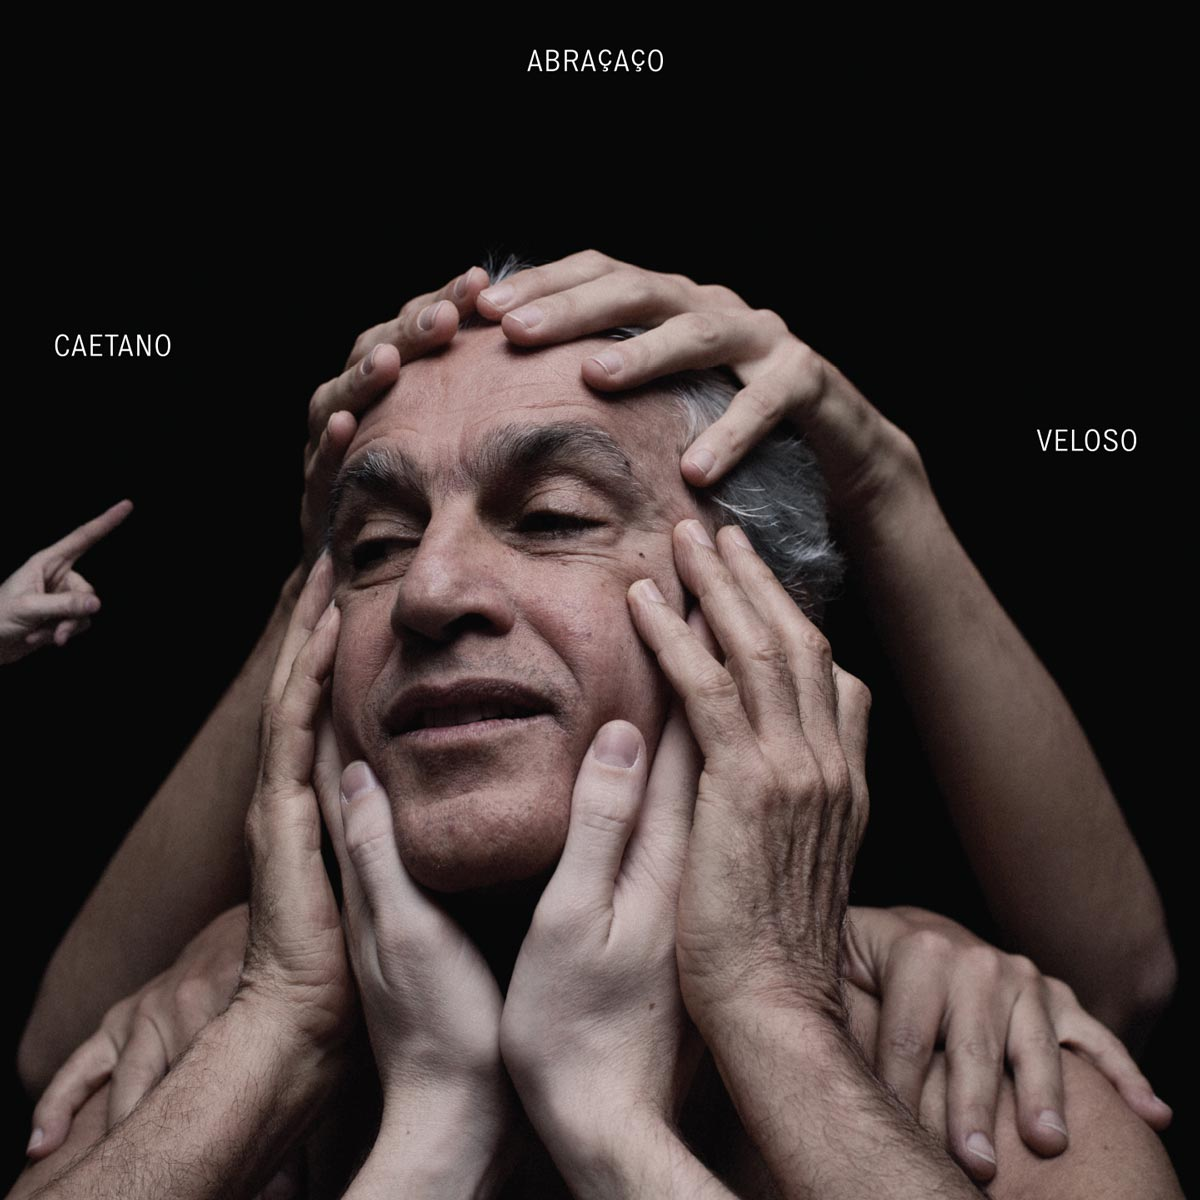 LP Caetano Veloso Abraçaço